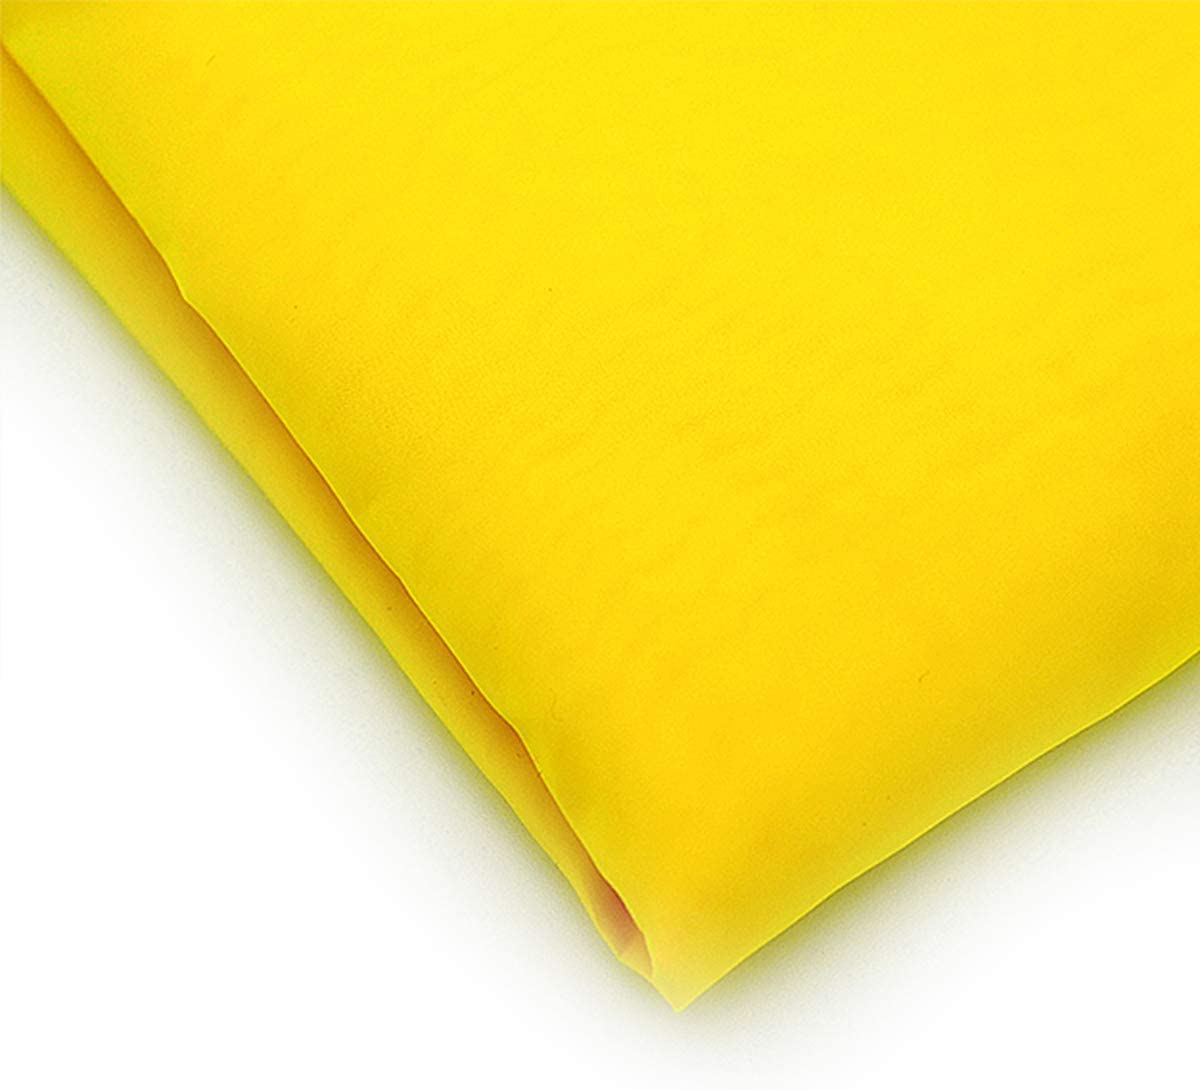 White 24T INTBUYING 1 Yard Silk Screen Mesh Screen Printing Mesh Fabric 50 Inches Wide 60Mesh